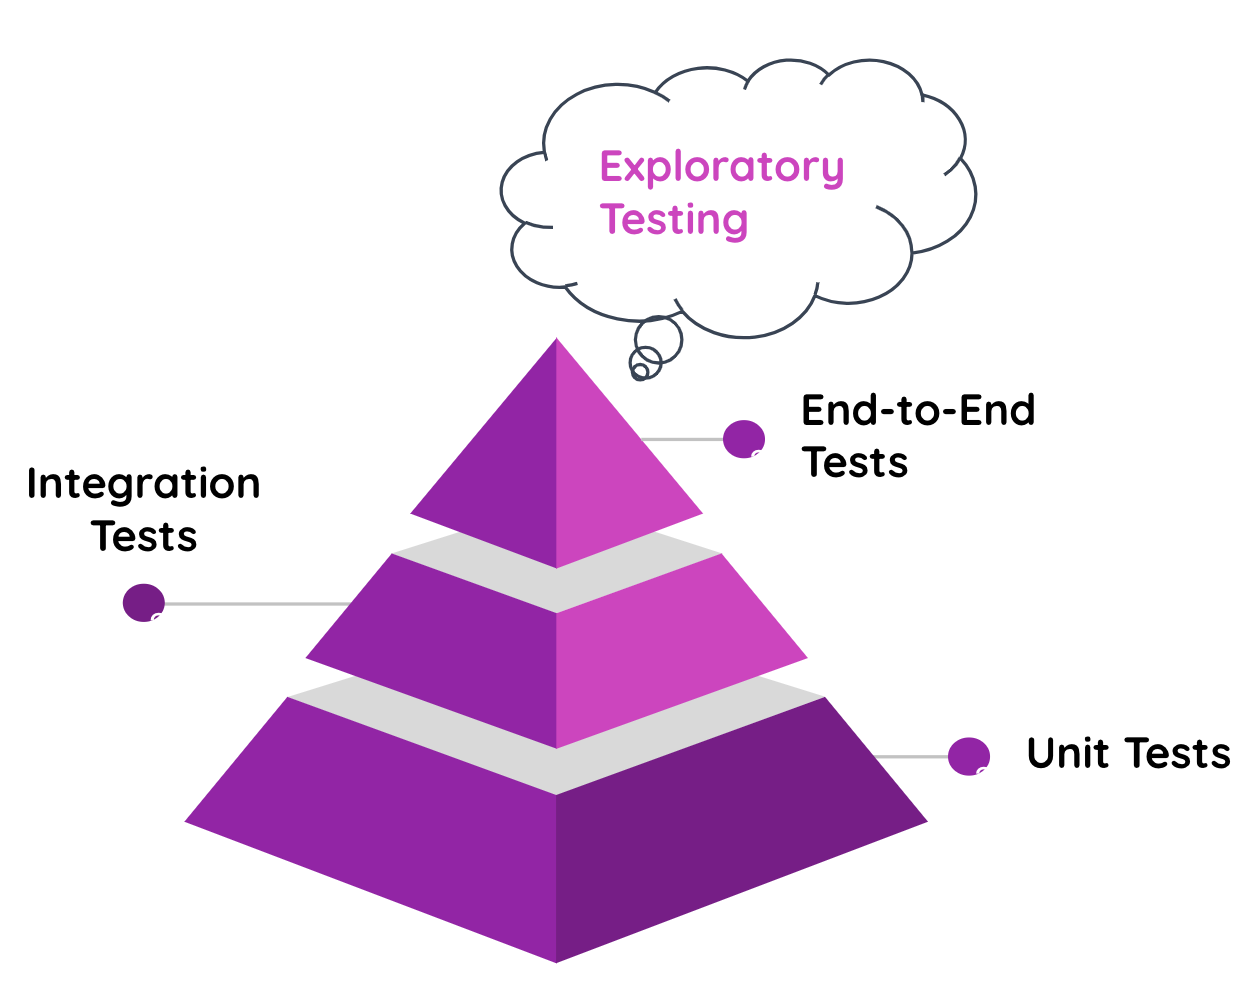 Exploratory testing pyramid